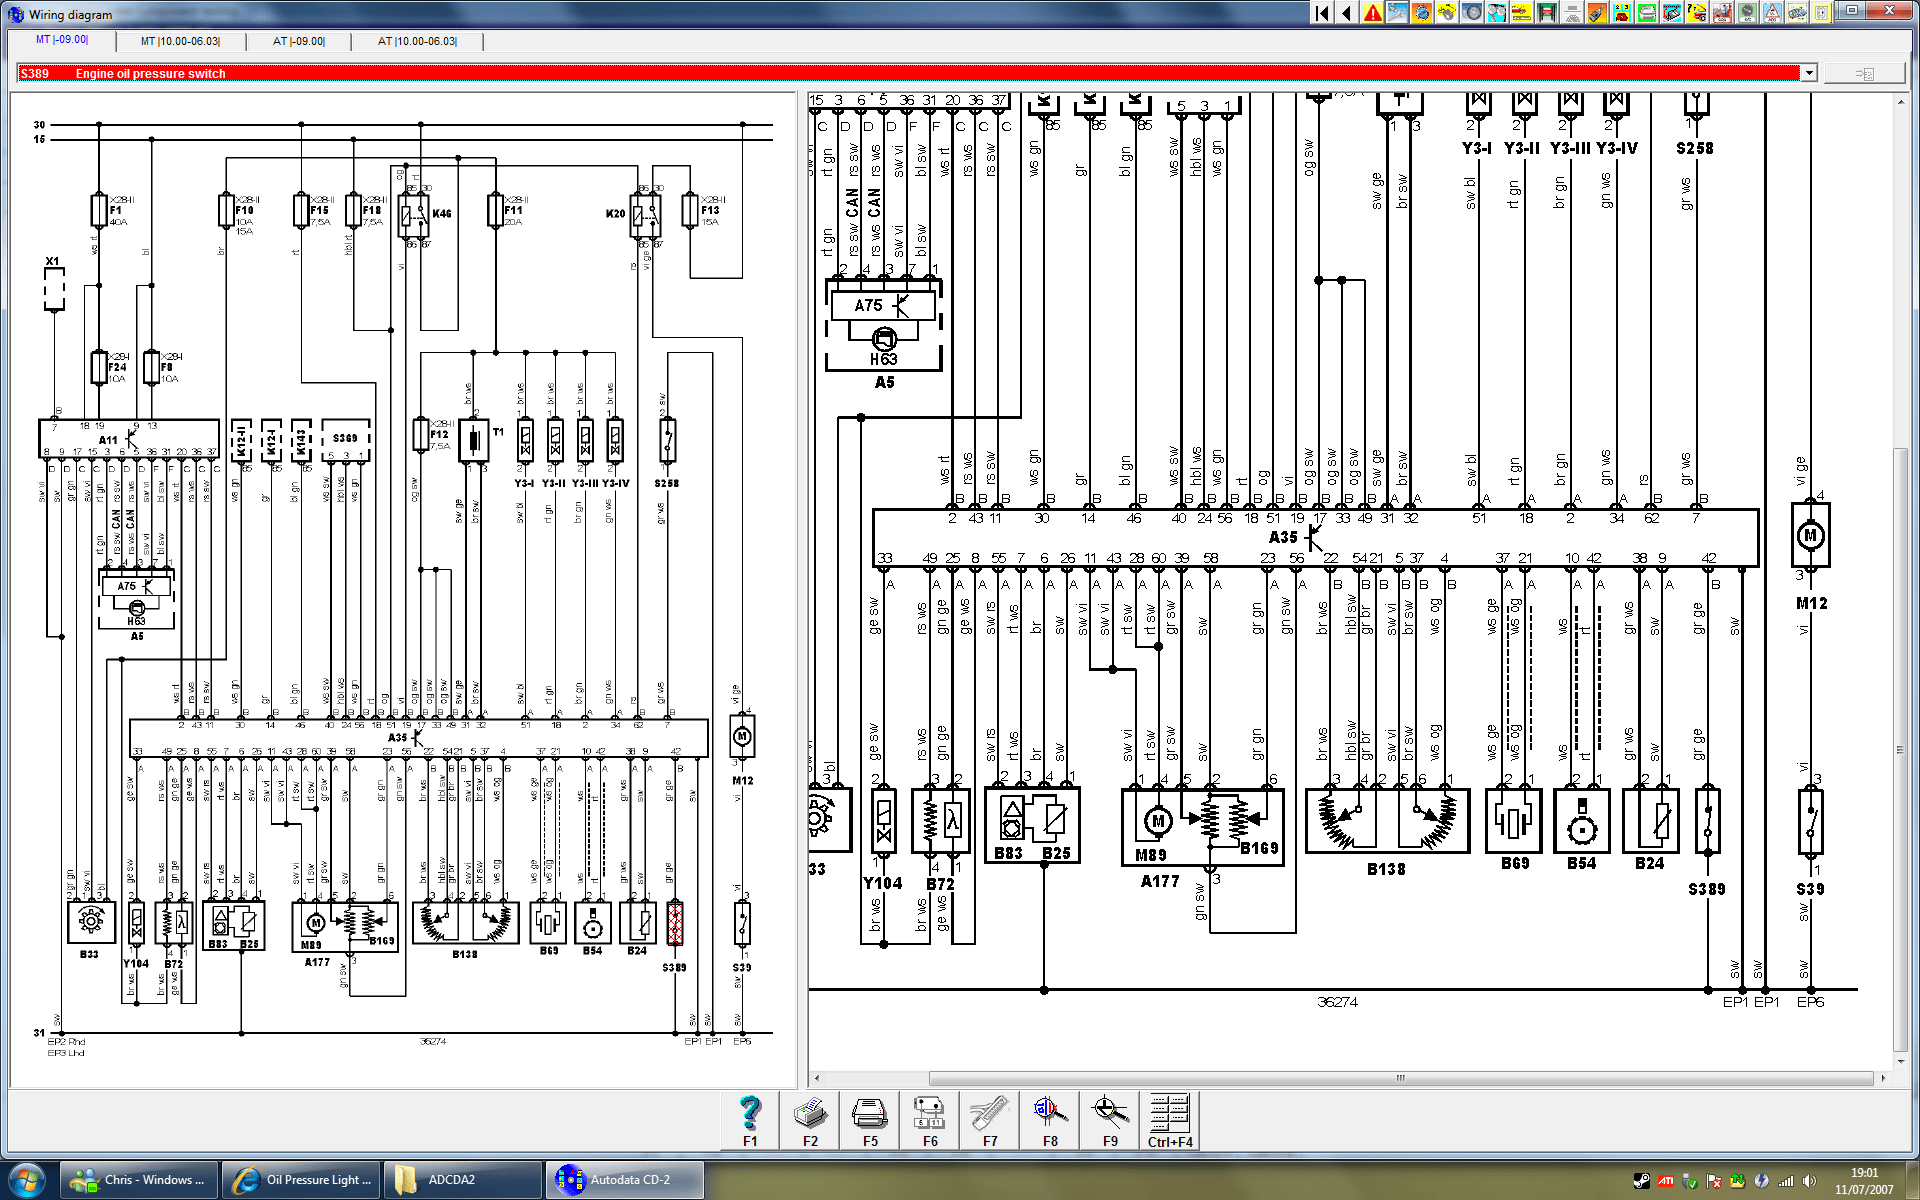 Opel Corsa 1998 Wiring Diagram Volkswagen Bus Engine Diagram Source Auto5 2020 Jeanjaures37 Fr